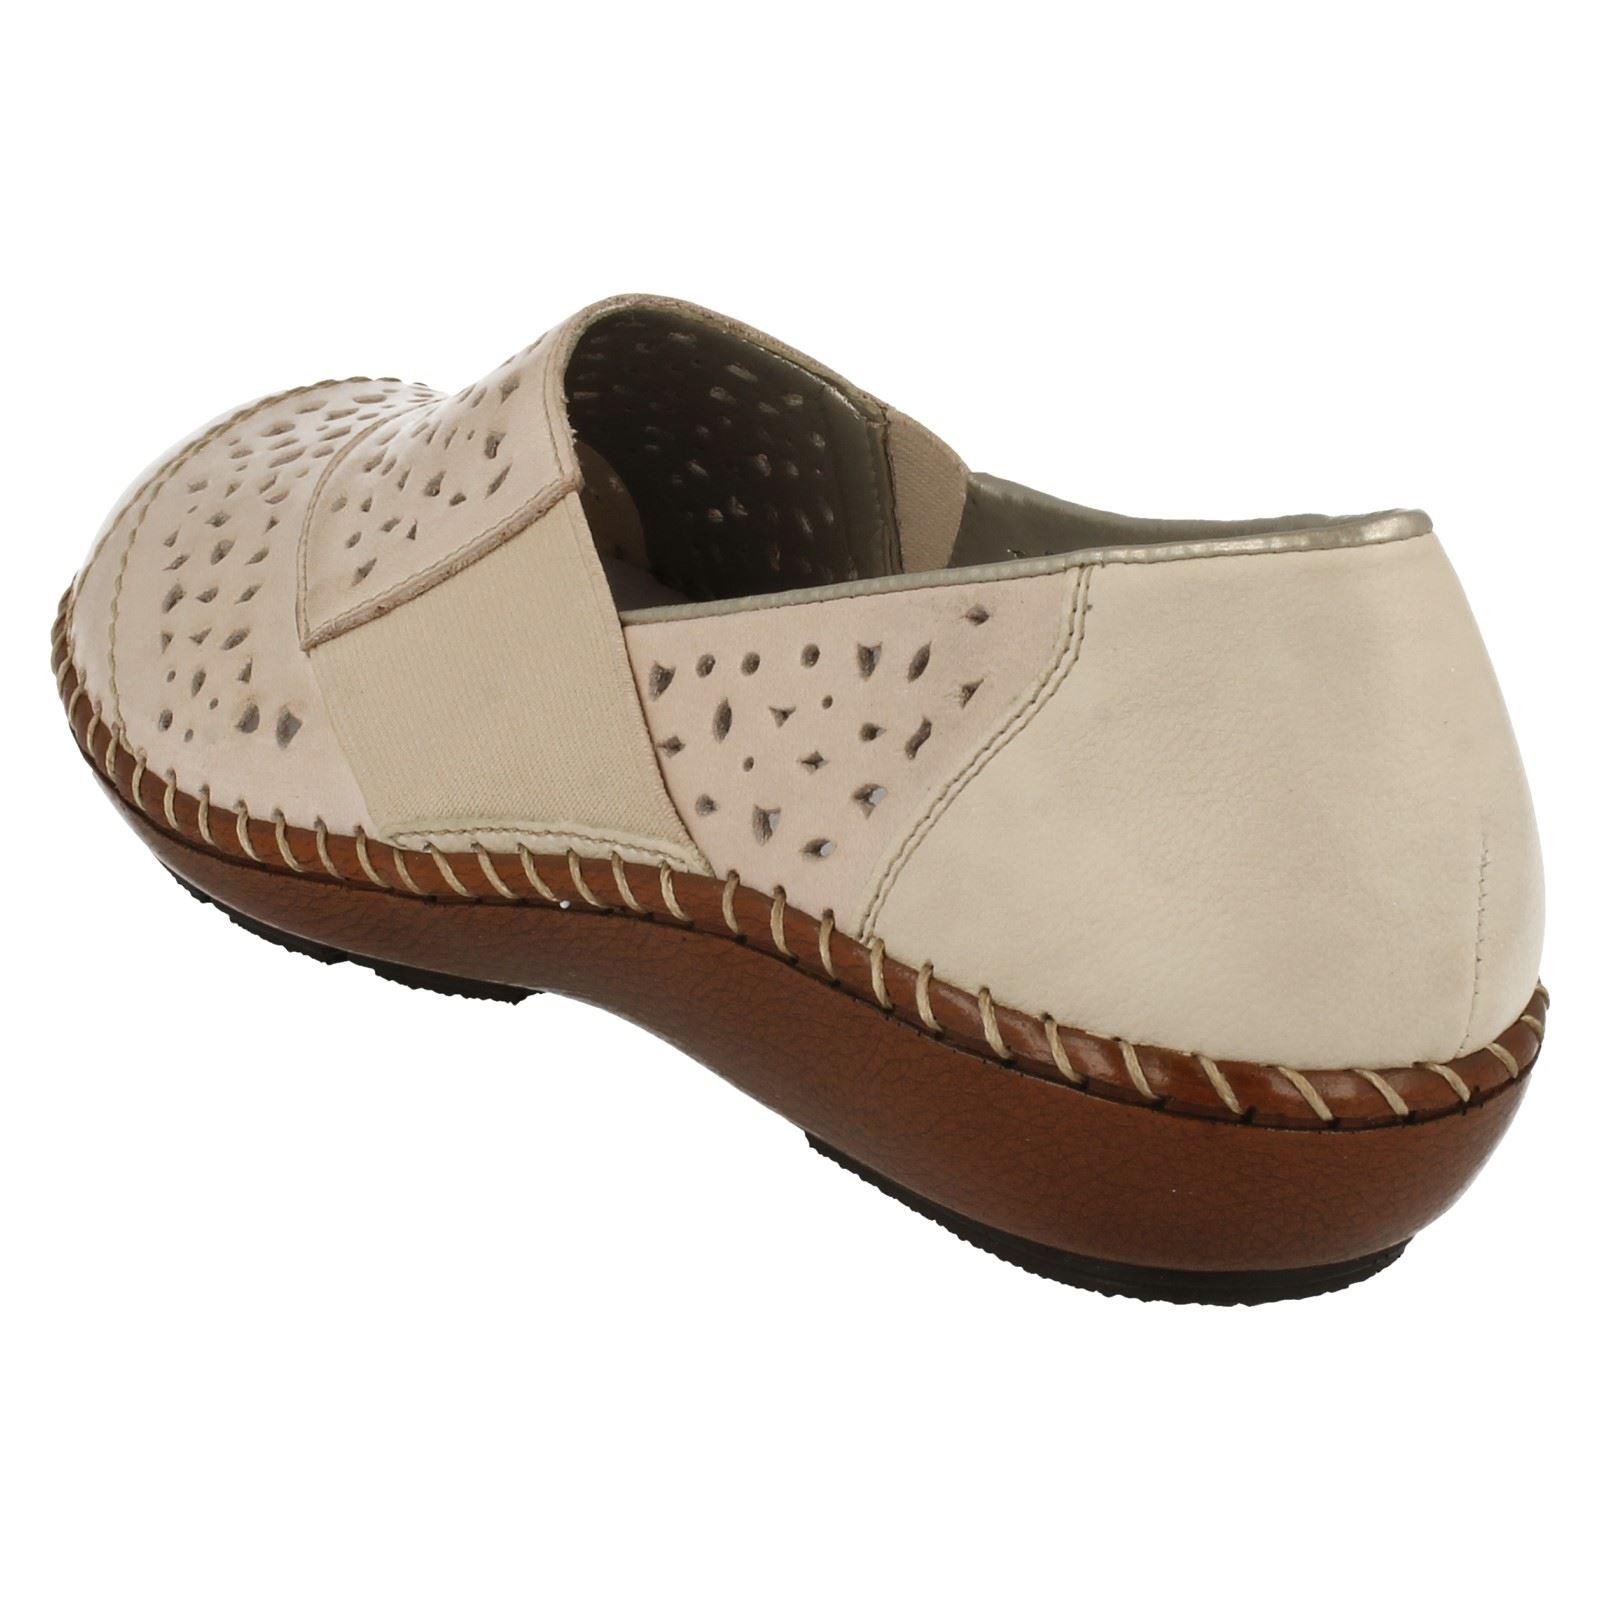 Ladies Rieker Slip On Casual Day Shoes 44856 60 Beige